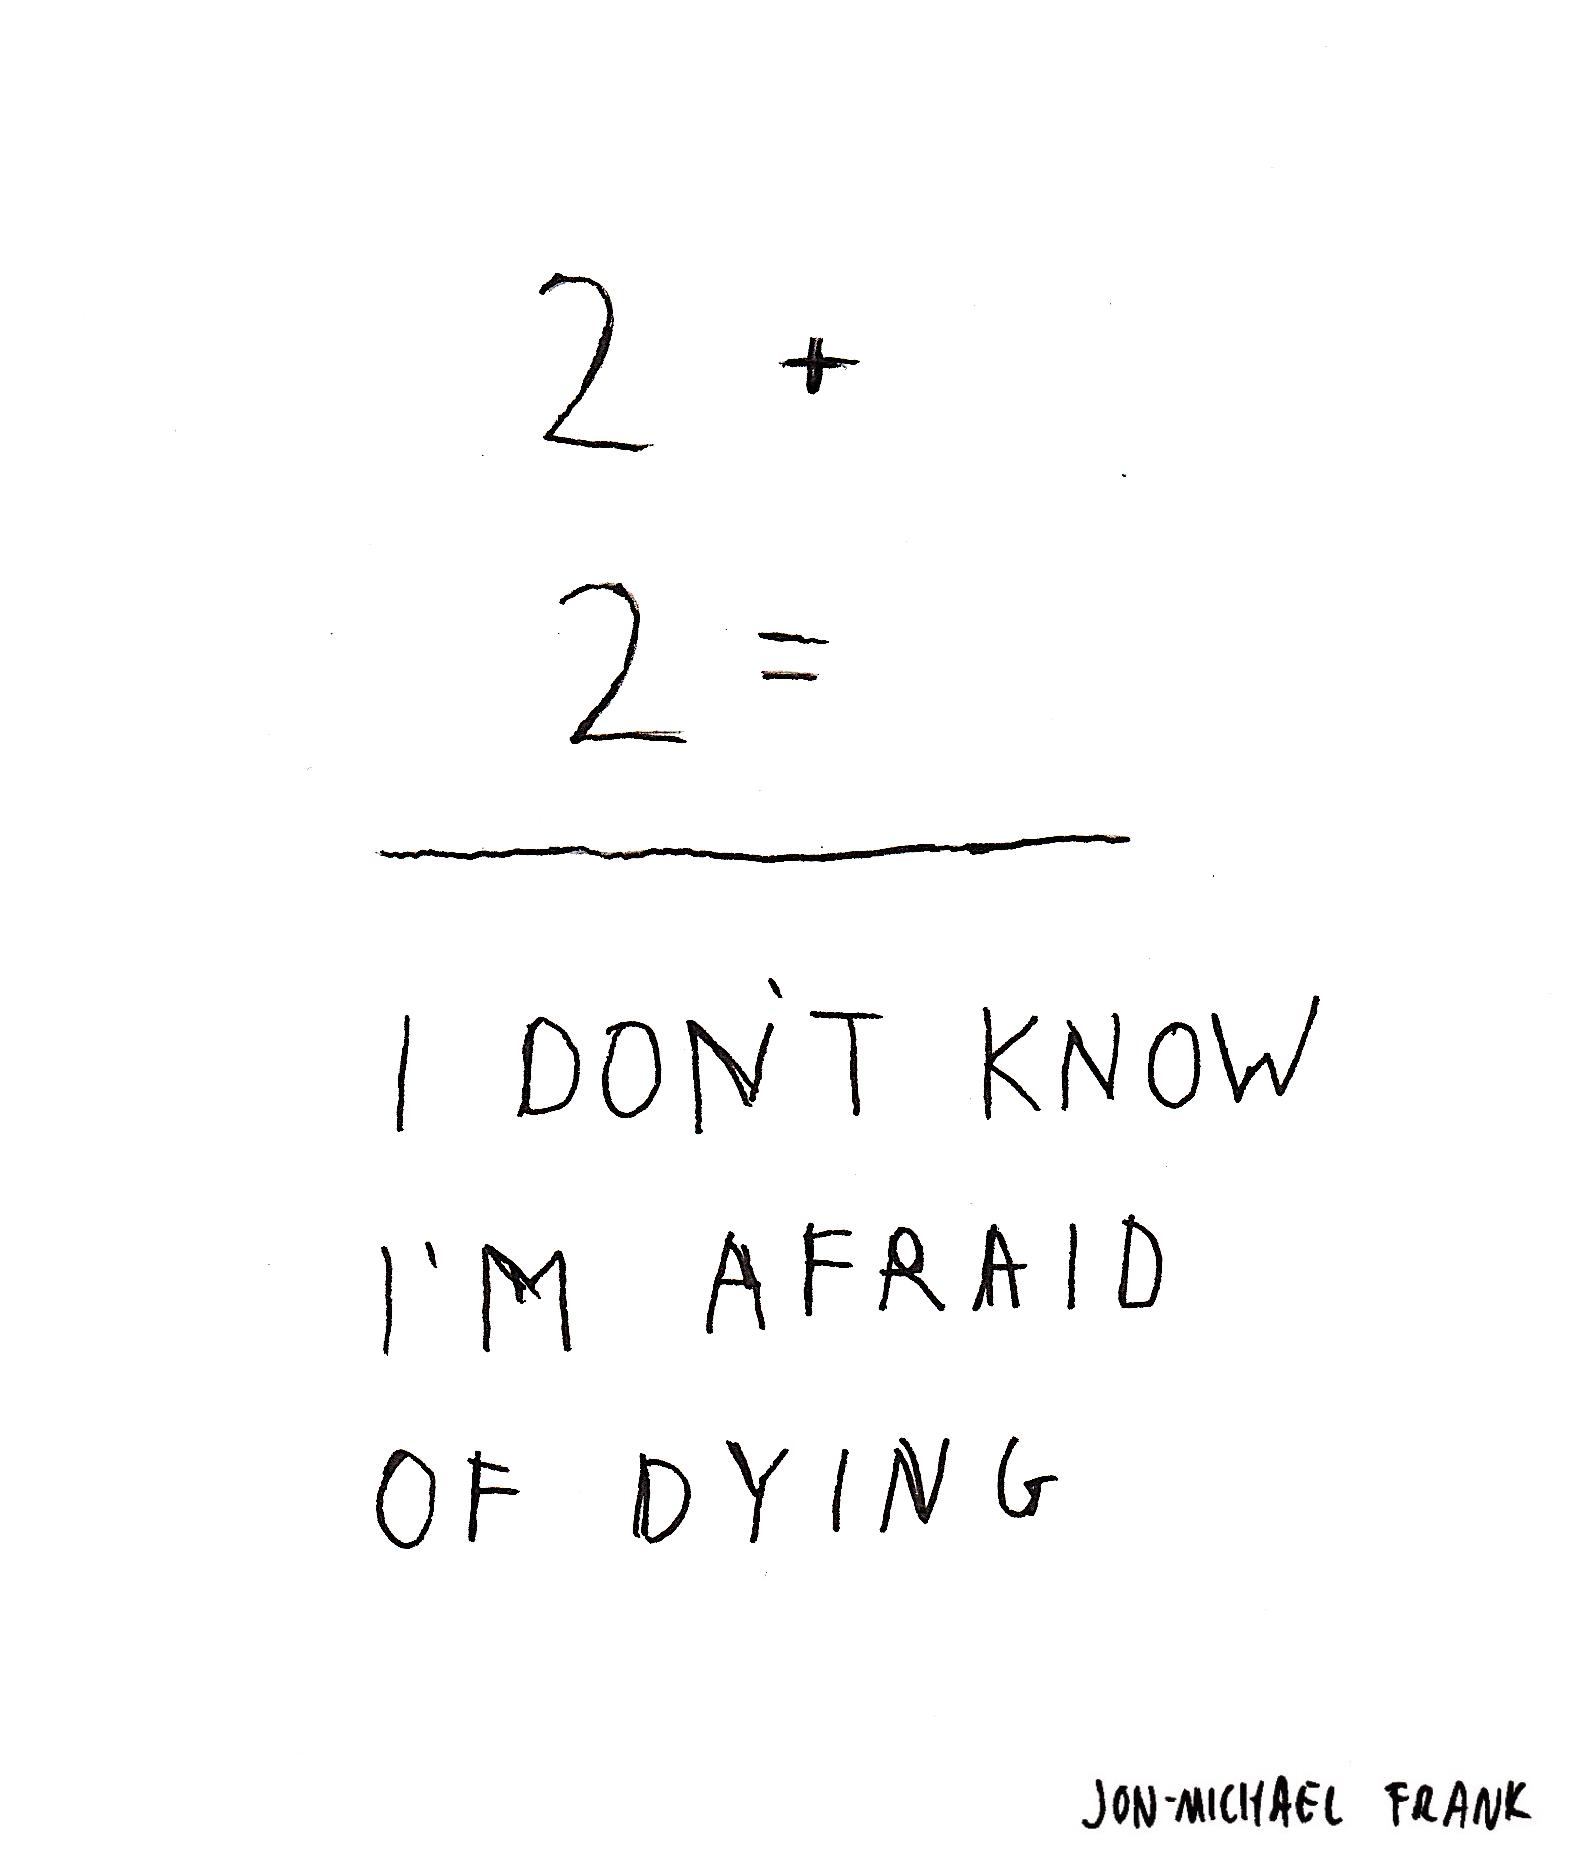 mathdying.jpg